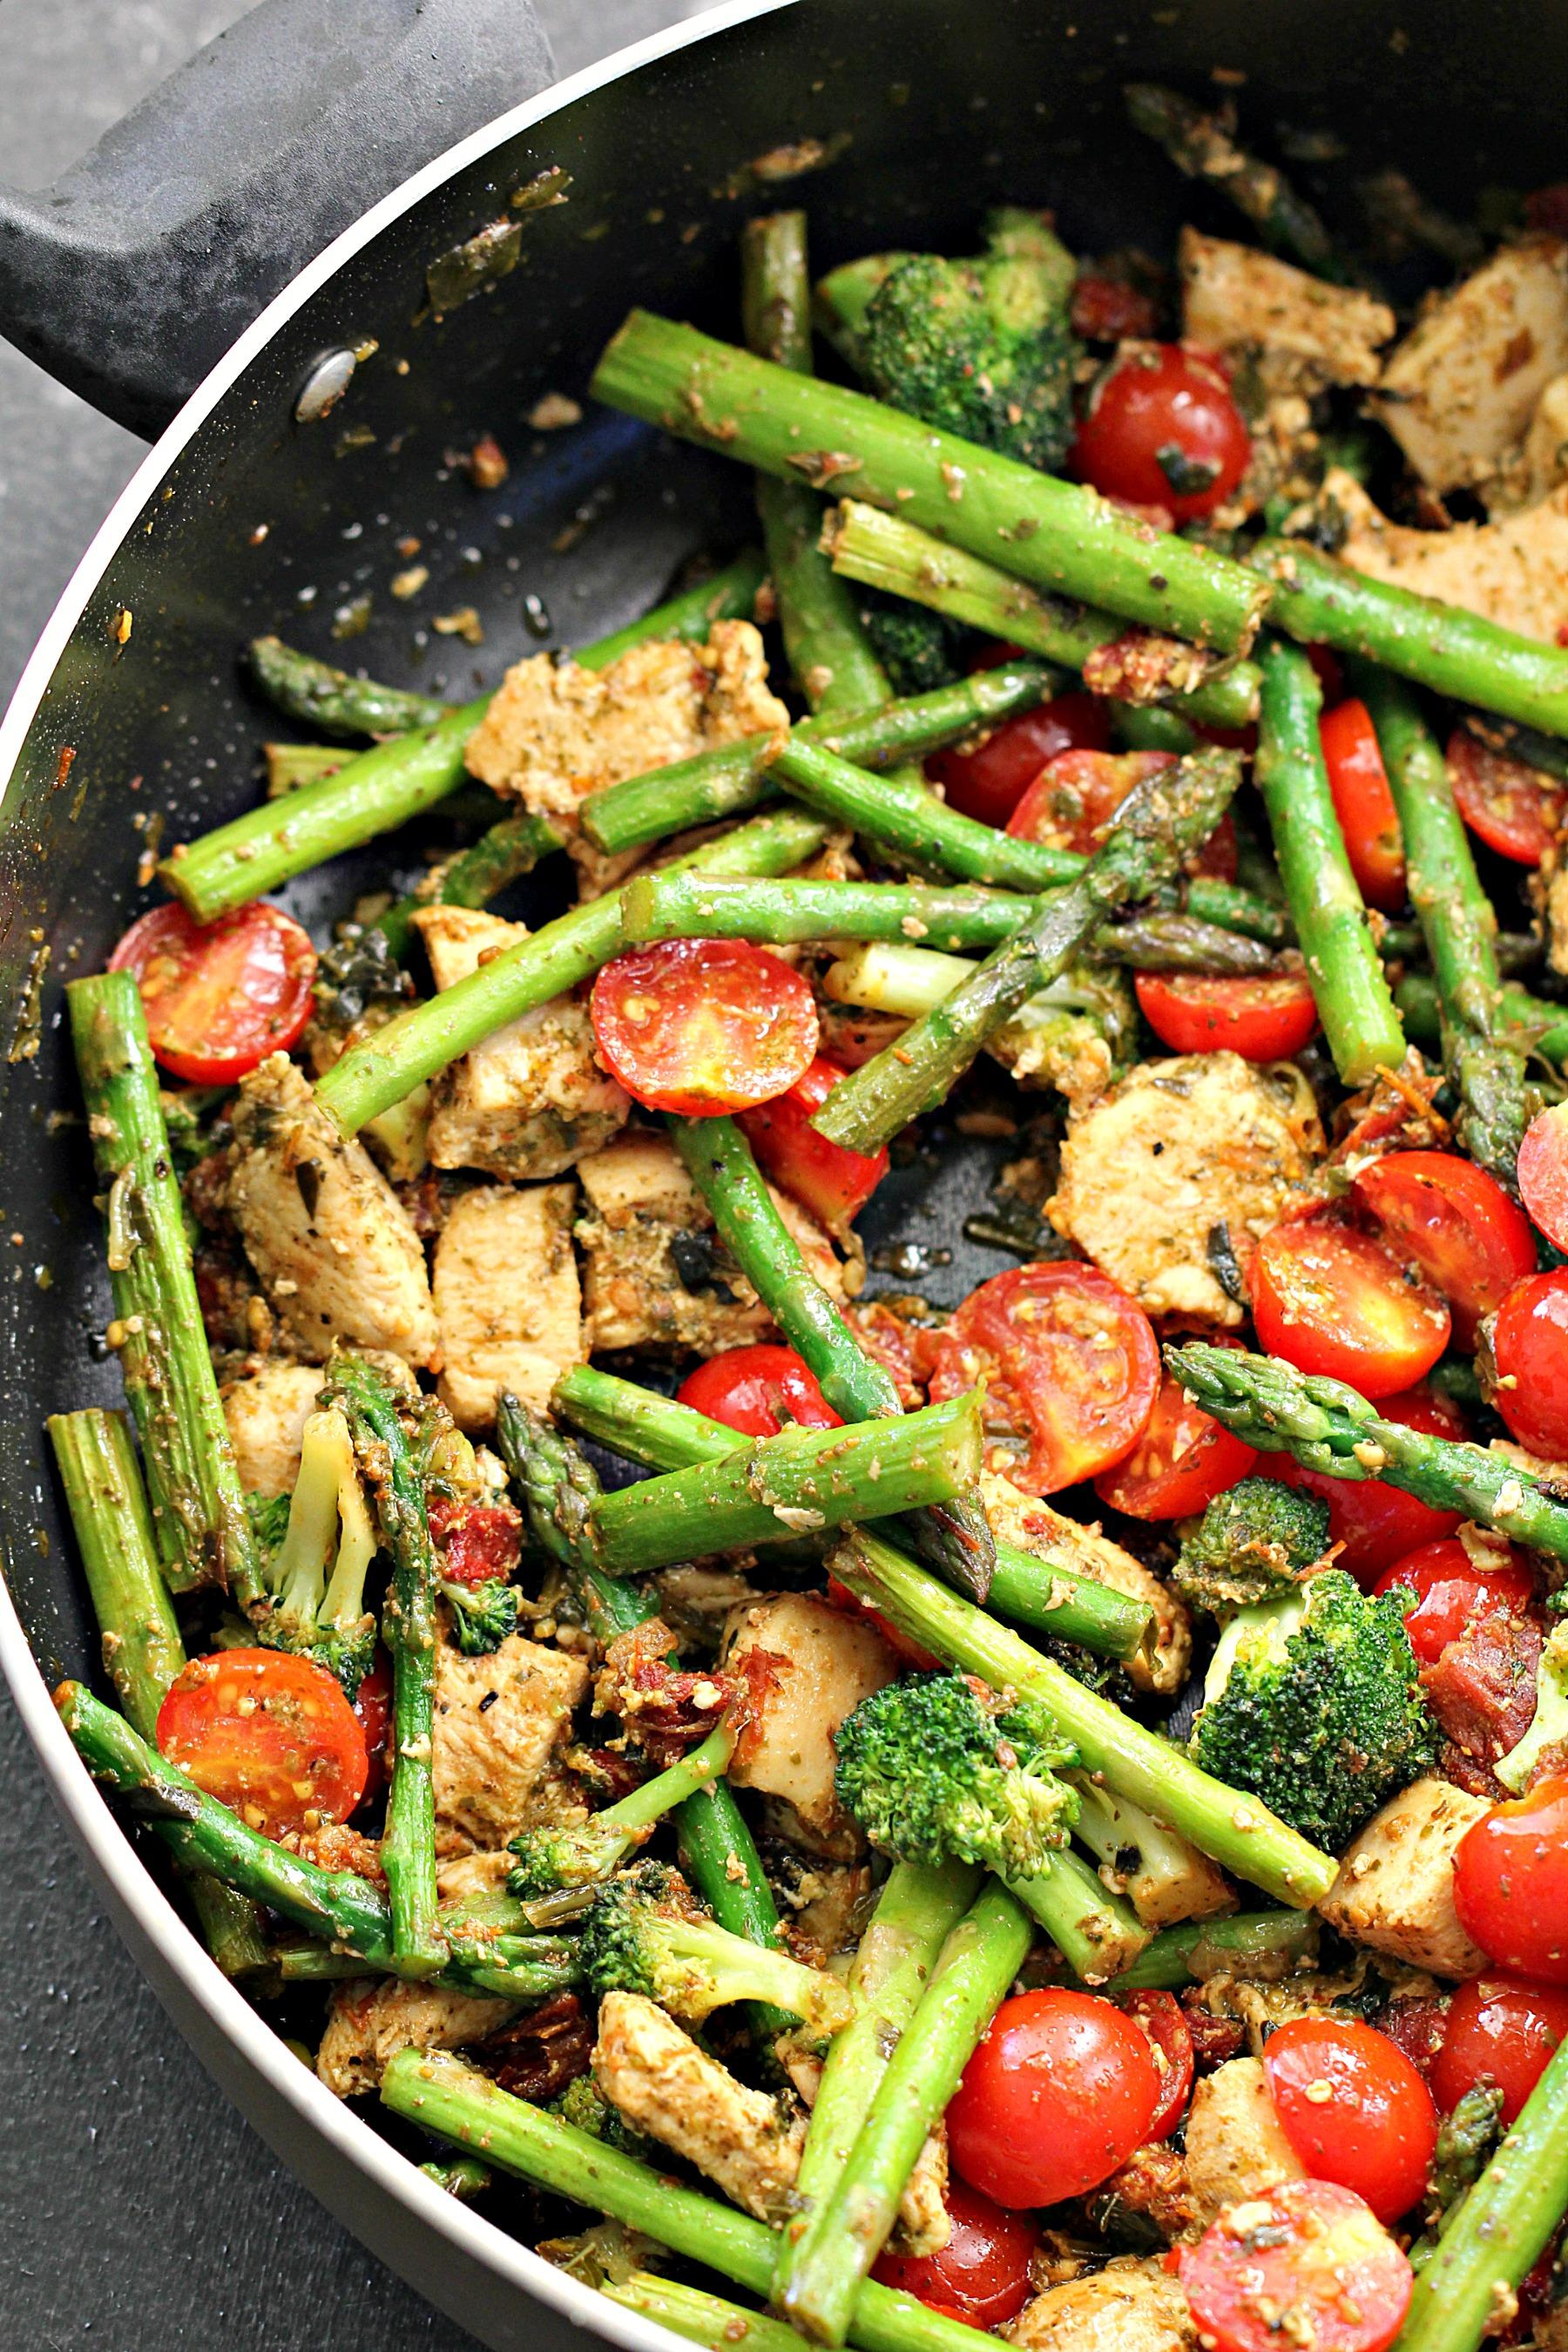 Chicken Pesto and Asparagus Skillet Recipe